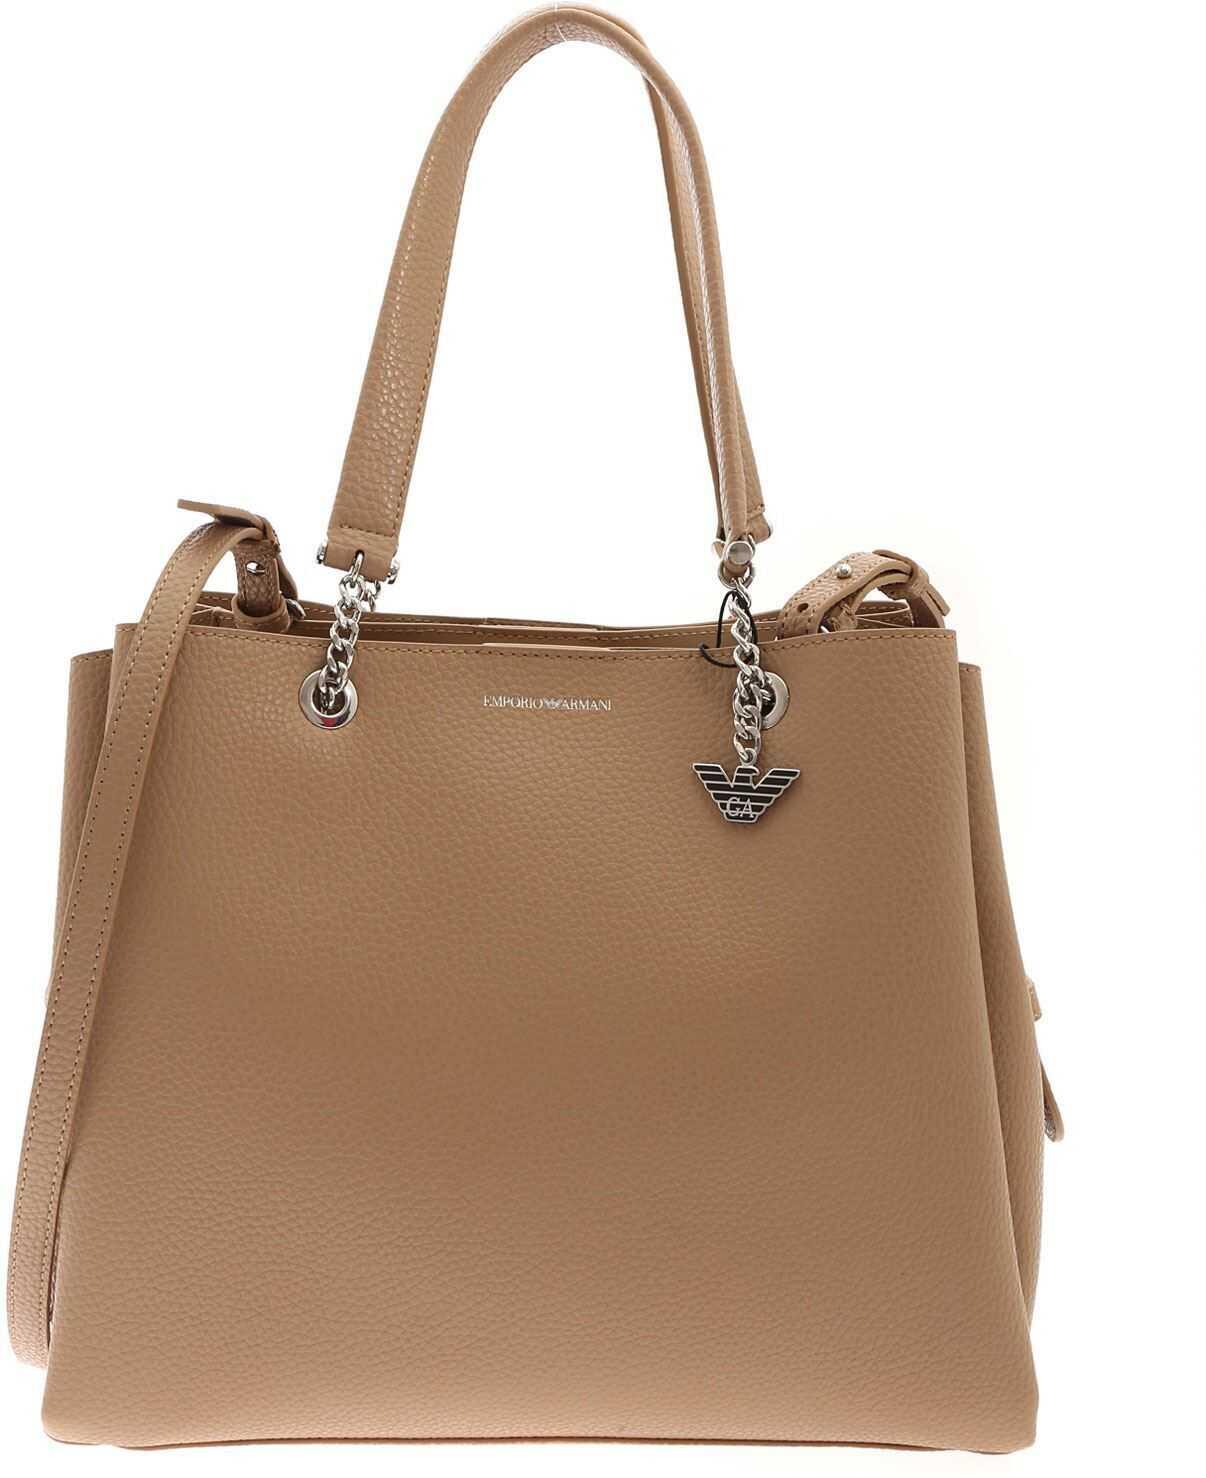 Emporio Armani Logo Charm Bag In Beige Y3D158YFN6E85215 Beige imagine b-mall.ro